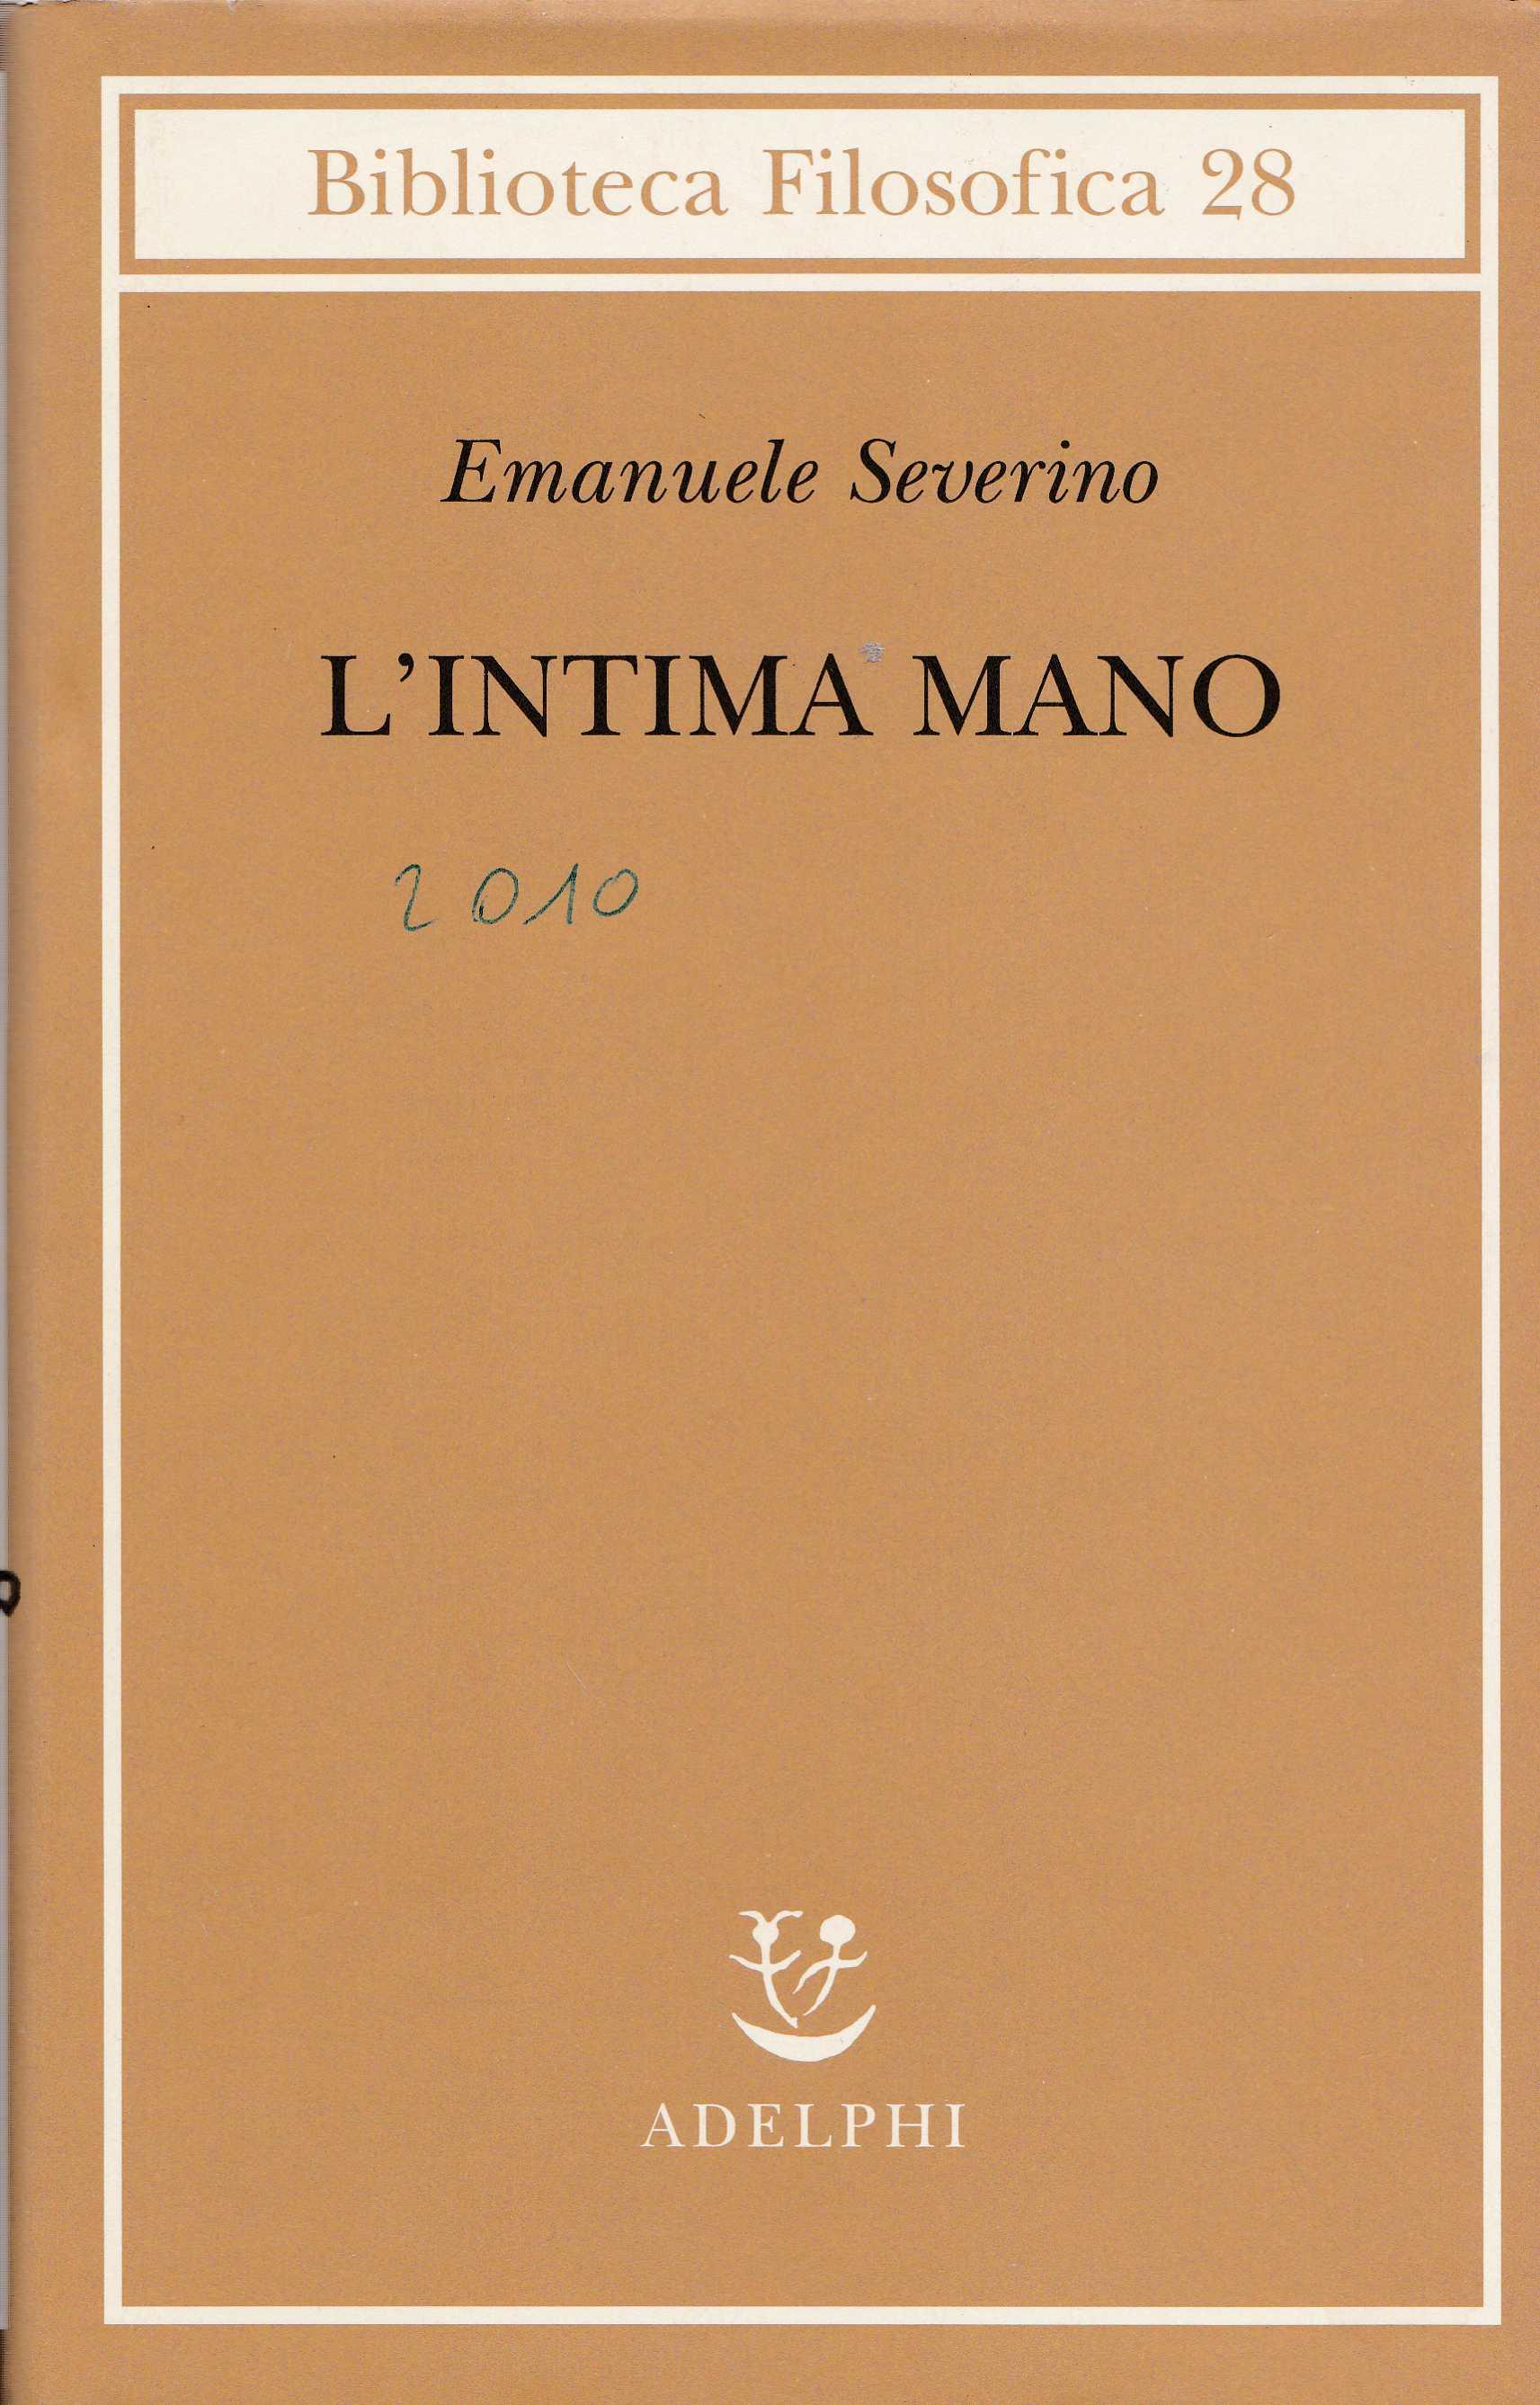 intimamano4283